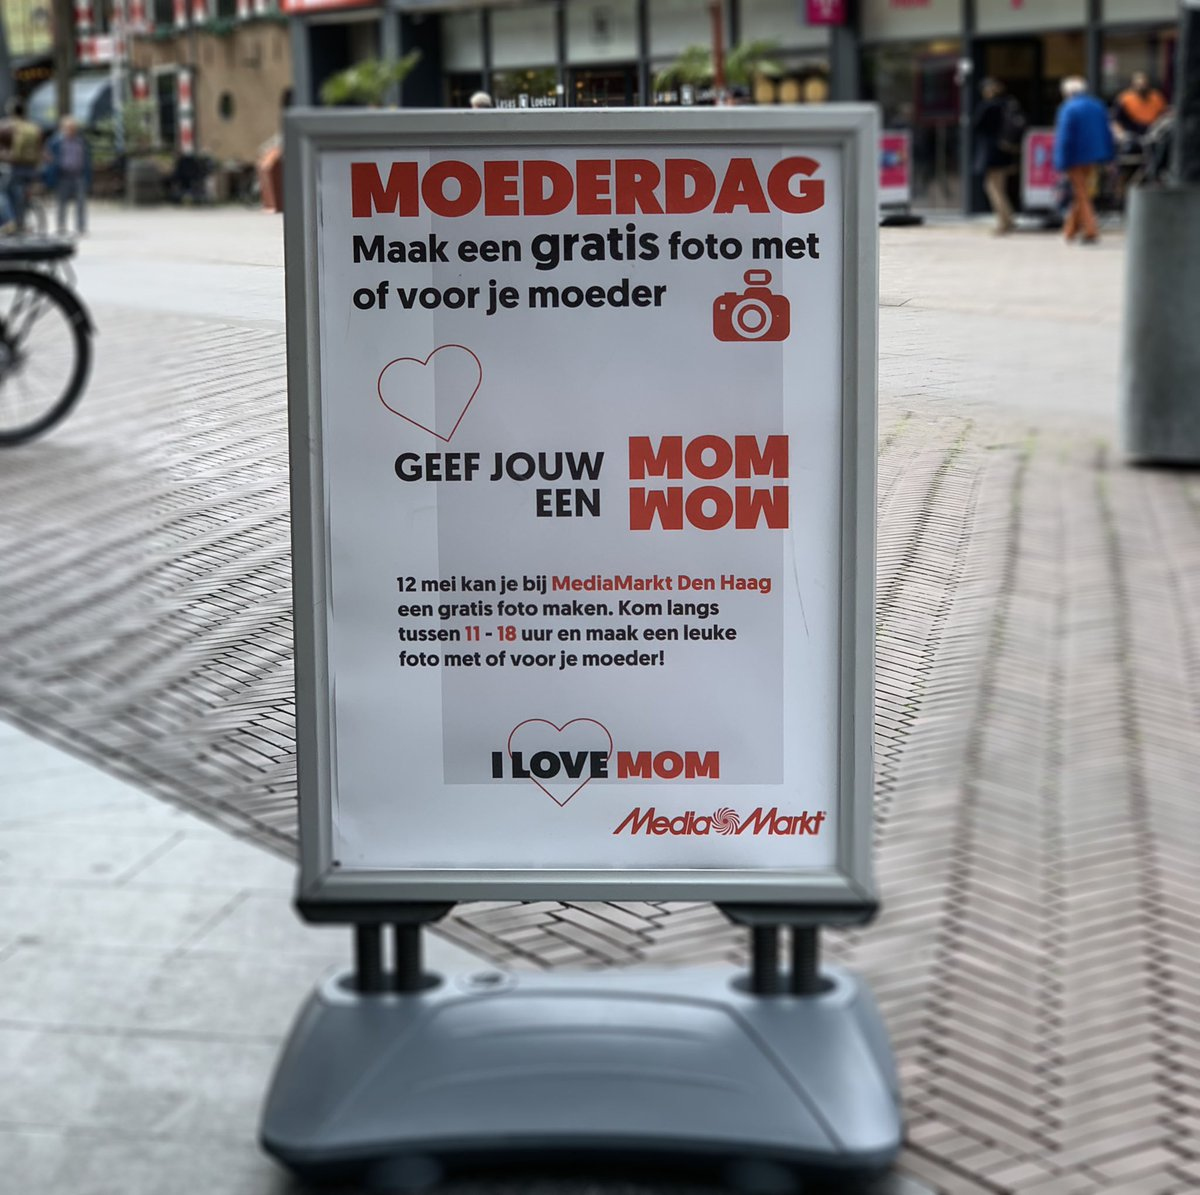 421e02b797c #MediaMarktDenHaag #MediaMarkt #DenHaag #moederdagpic.twitter.com/mBBnAAZYfX